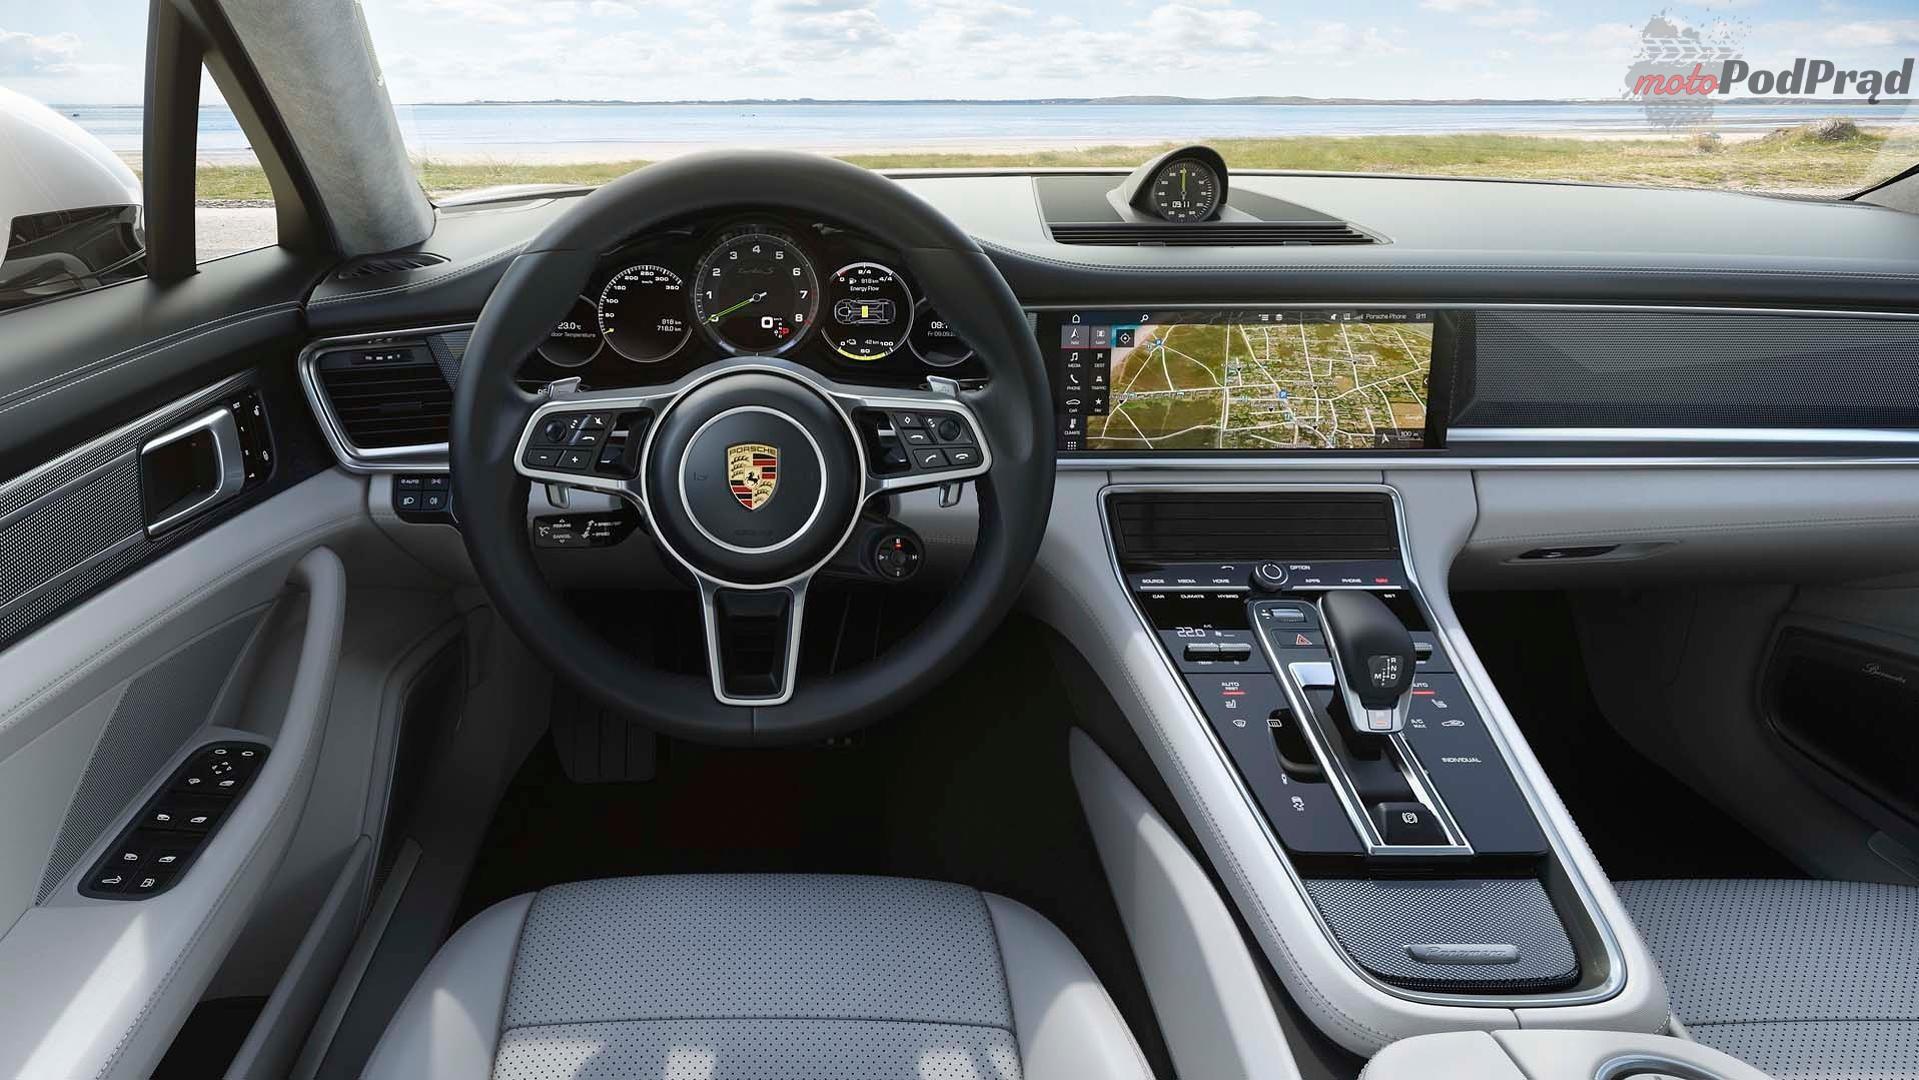 2018 porsche panamera turbo s e hybrid sport turismo 1 680 KM w Panamerze Sport Turismo